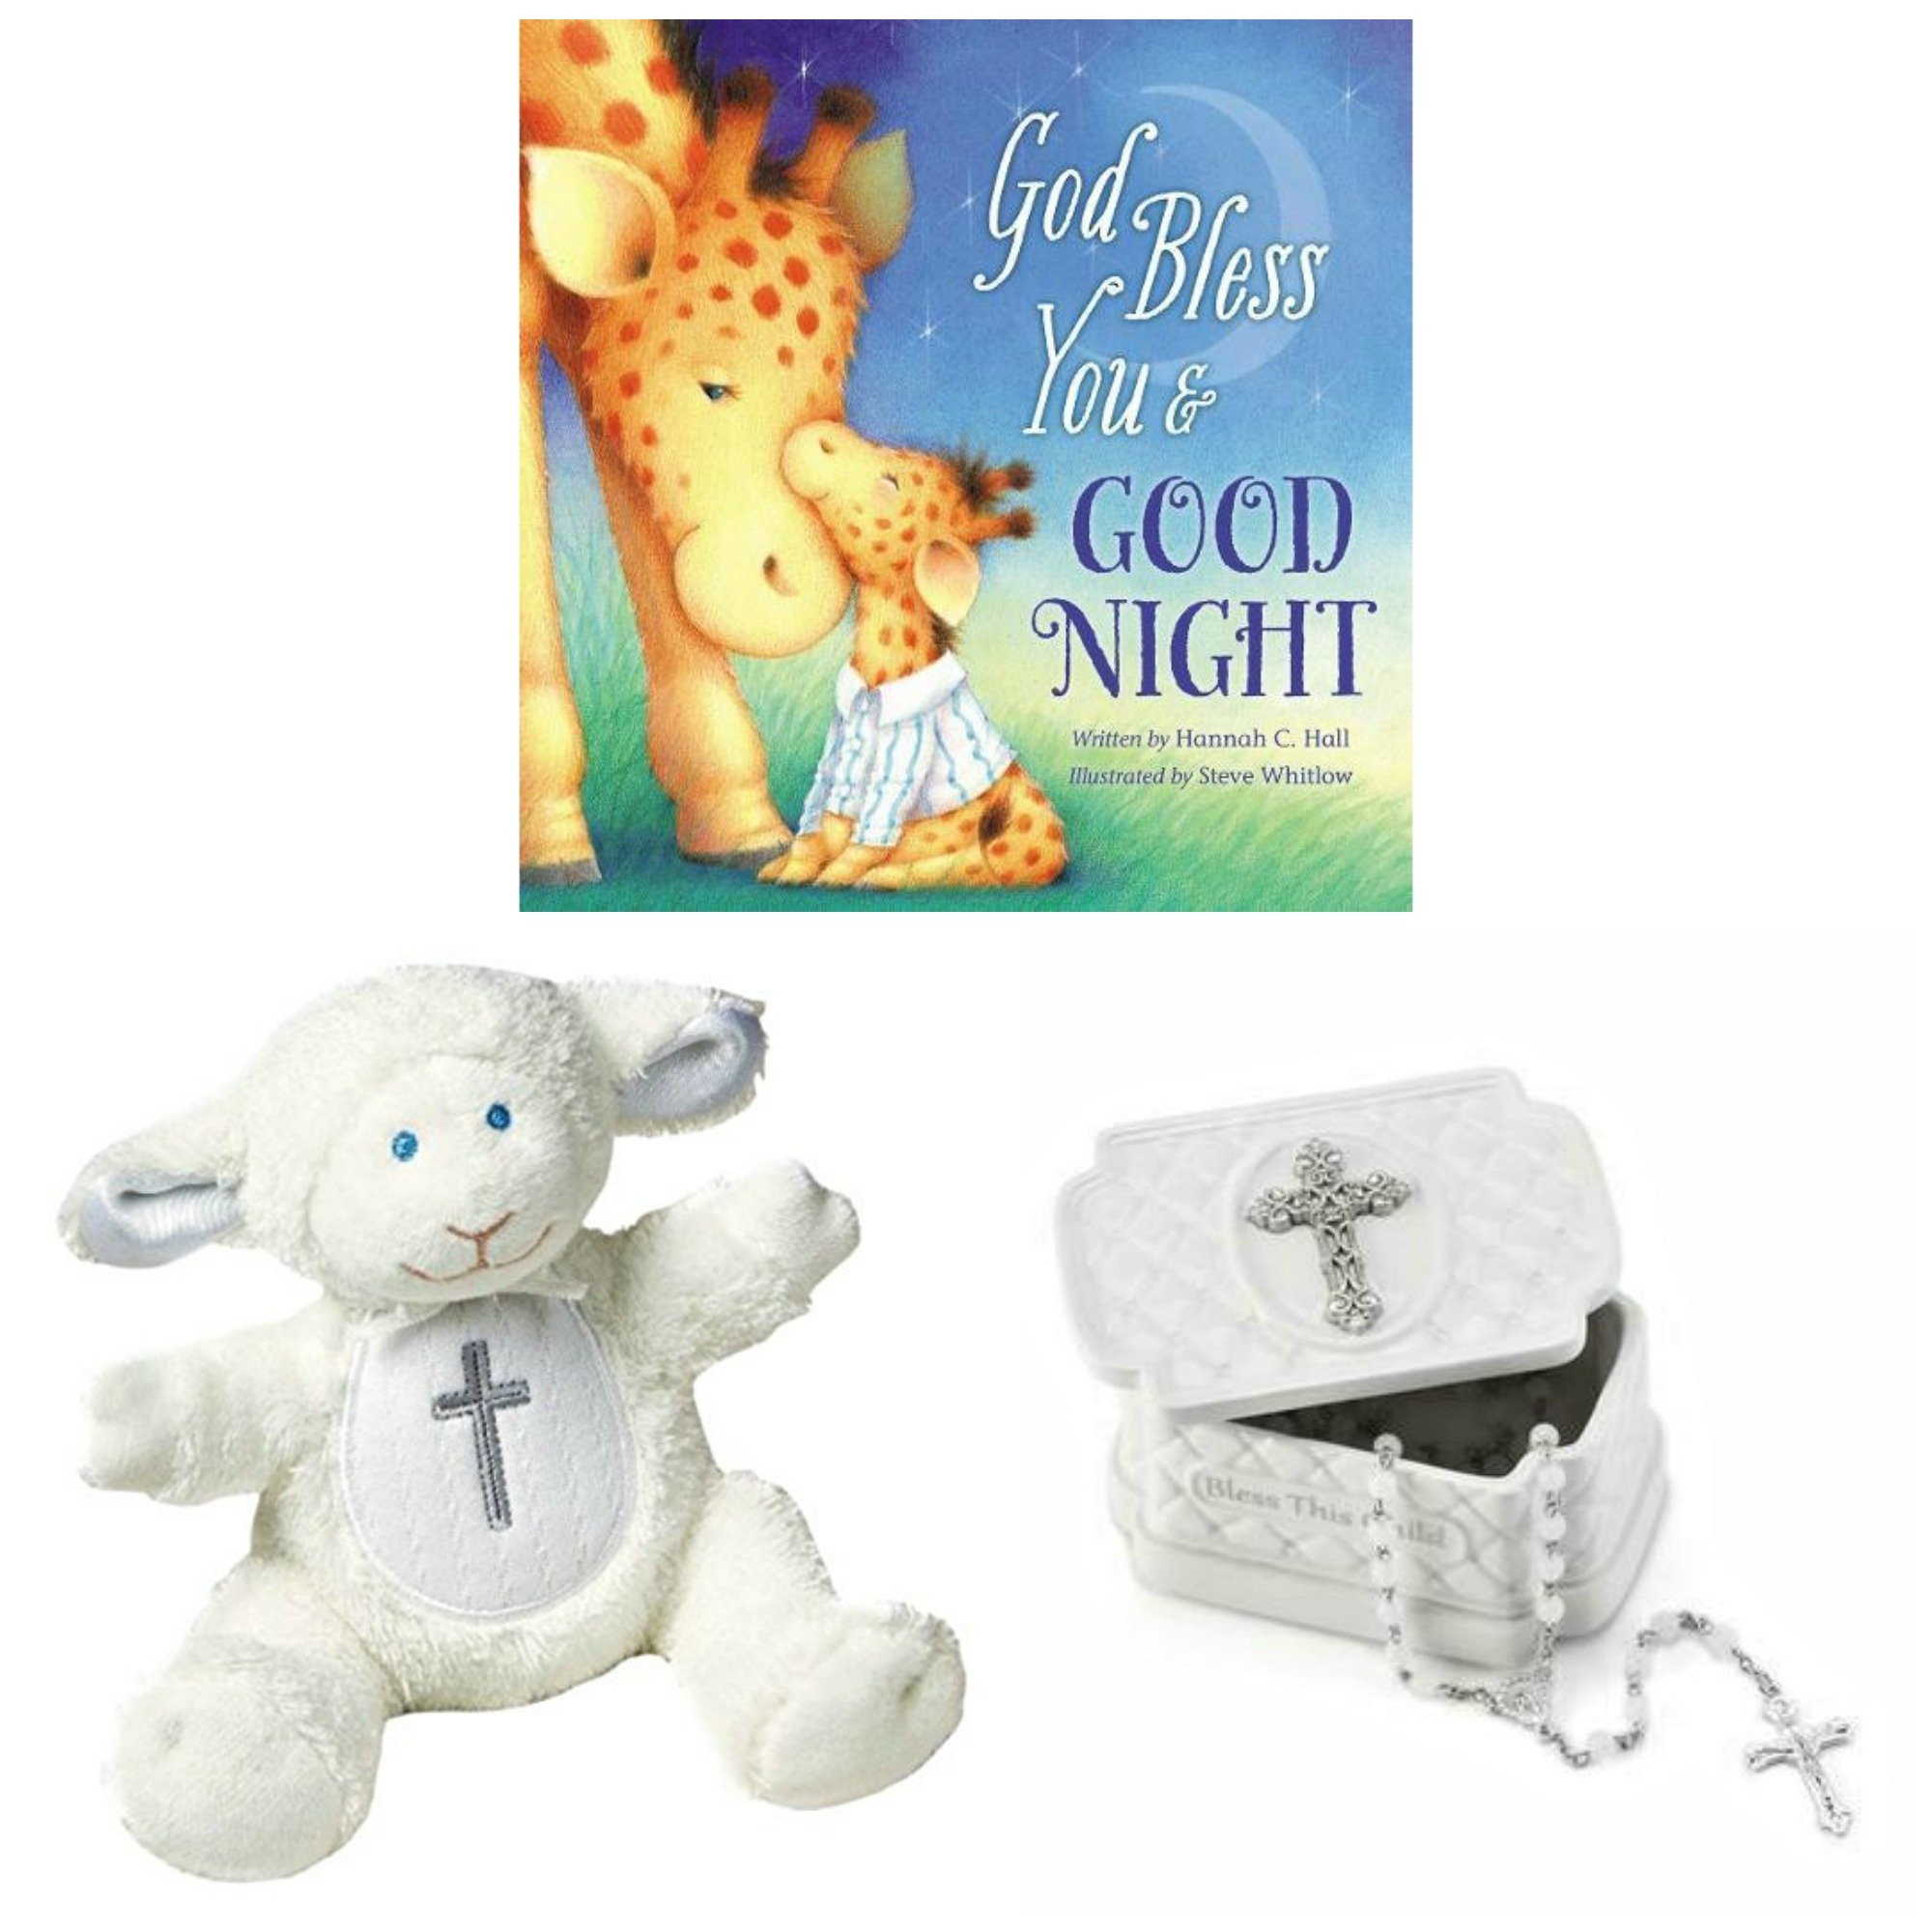 Baby Christening Baptism Gift Set – Keepsake Box Rosary Lamb and God Bless You & Goodnight Book